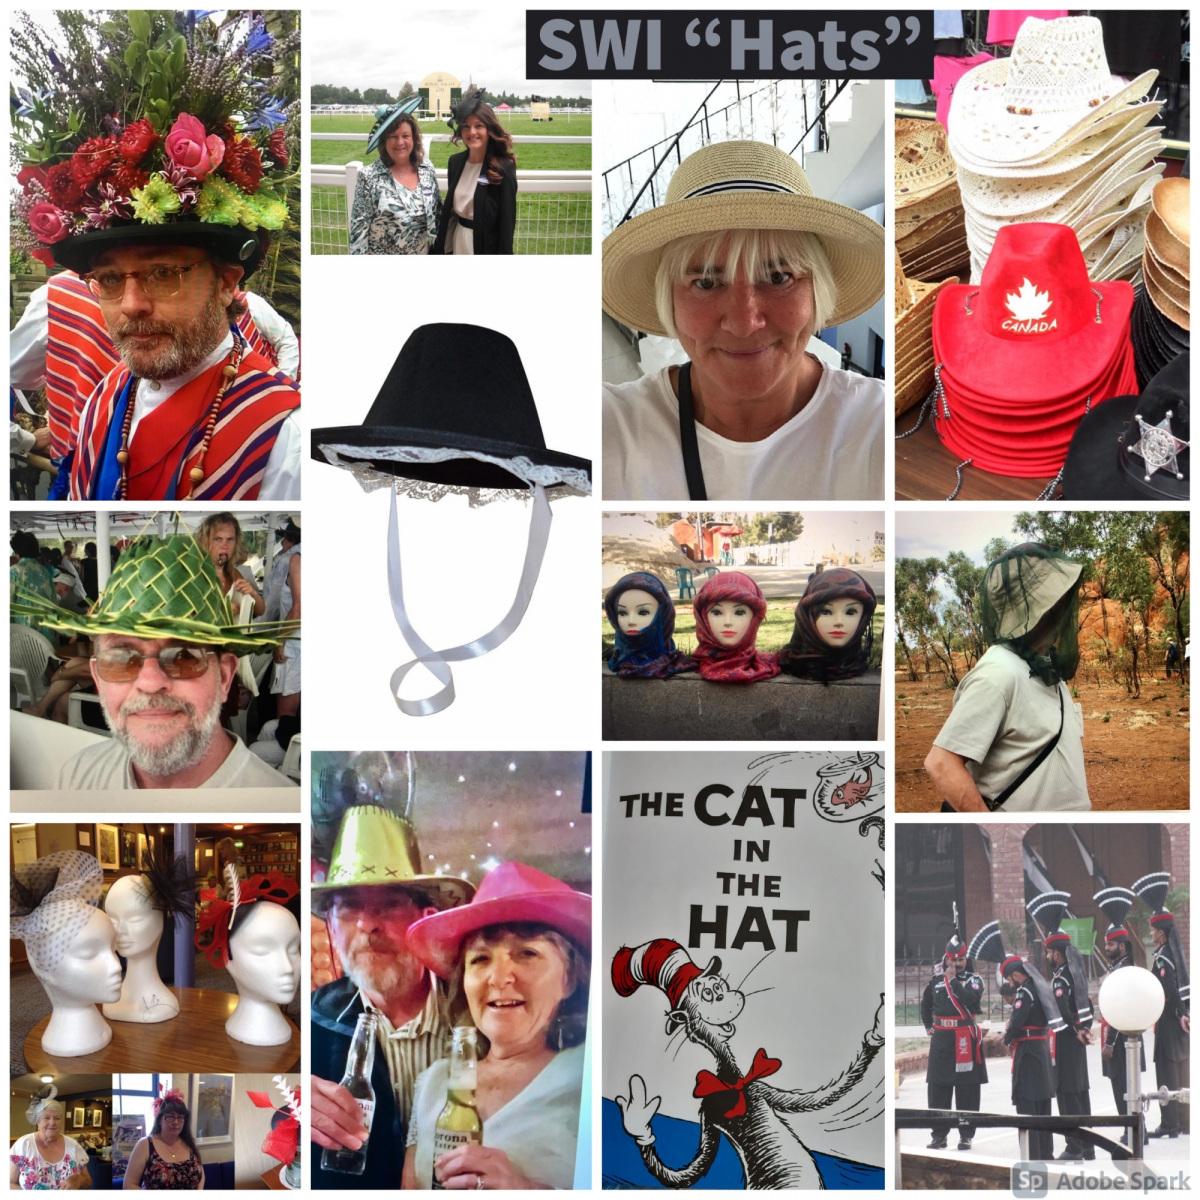 SWI-Hats-part2